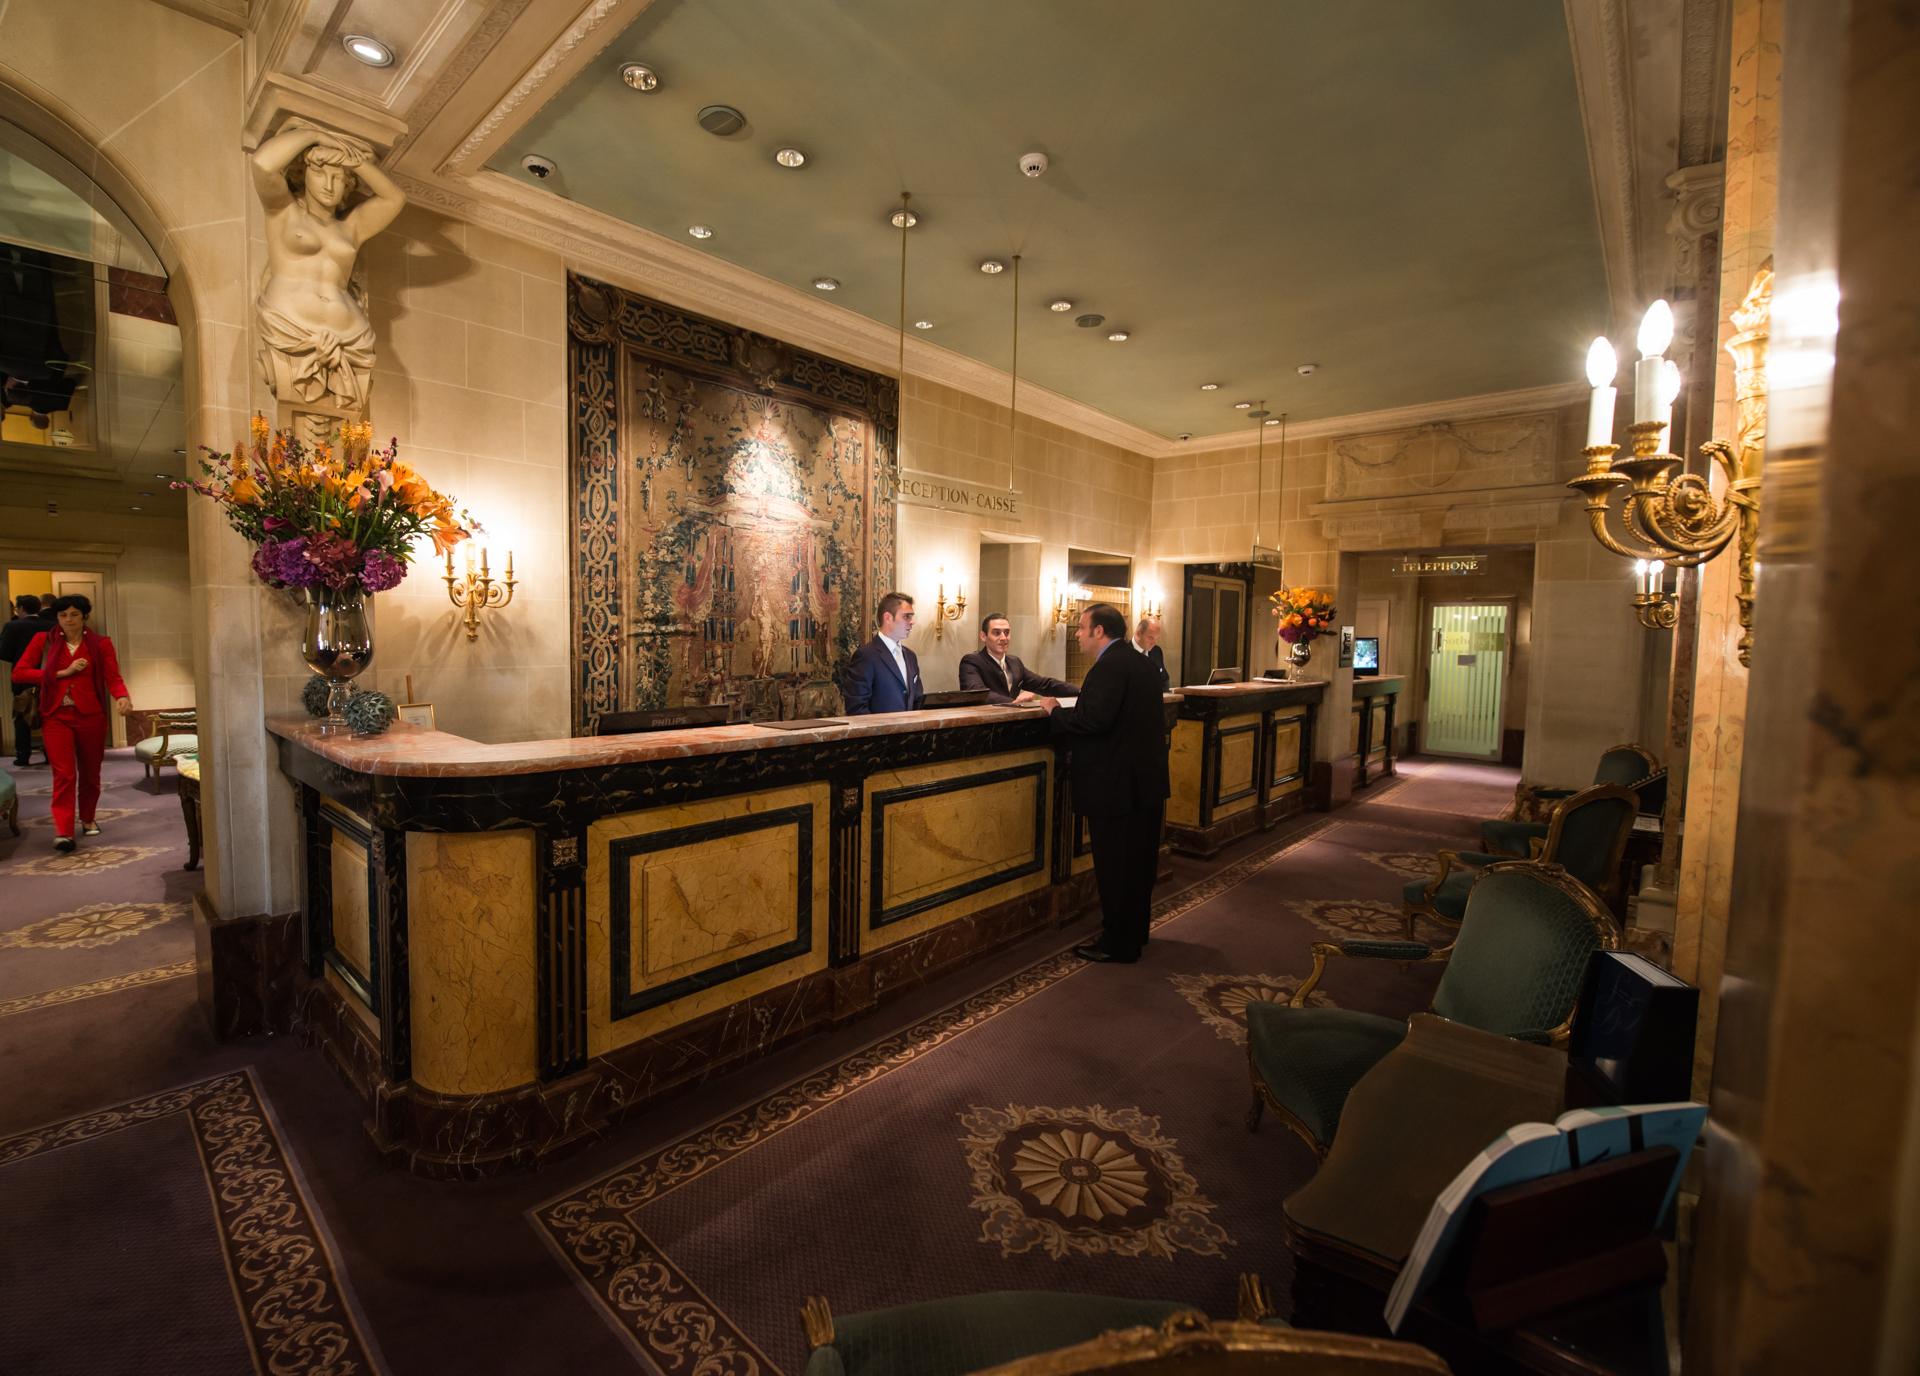 Beau-Rivage Hotel, Geneva